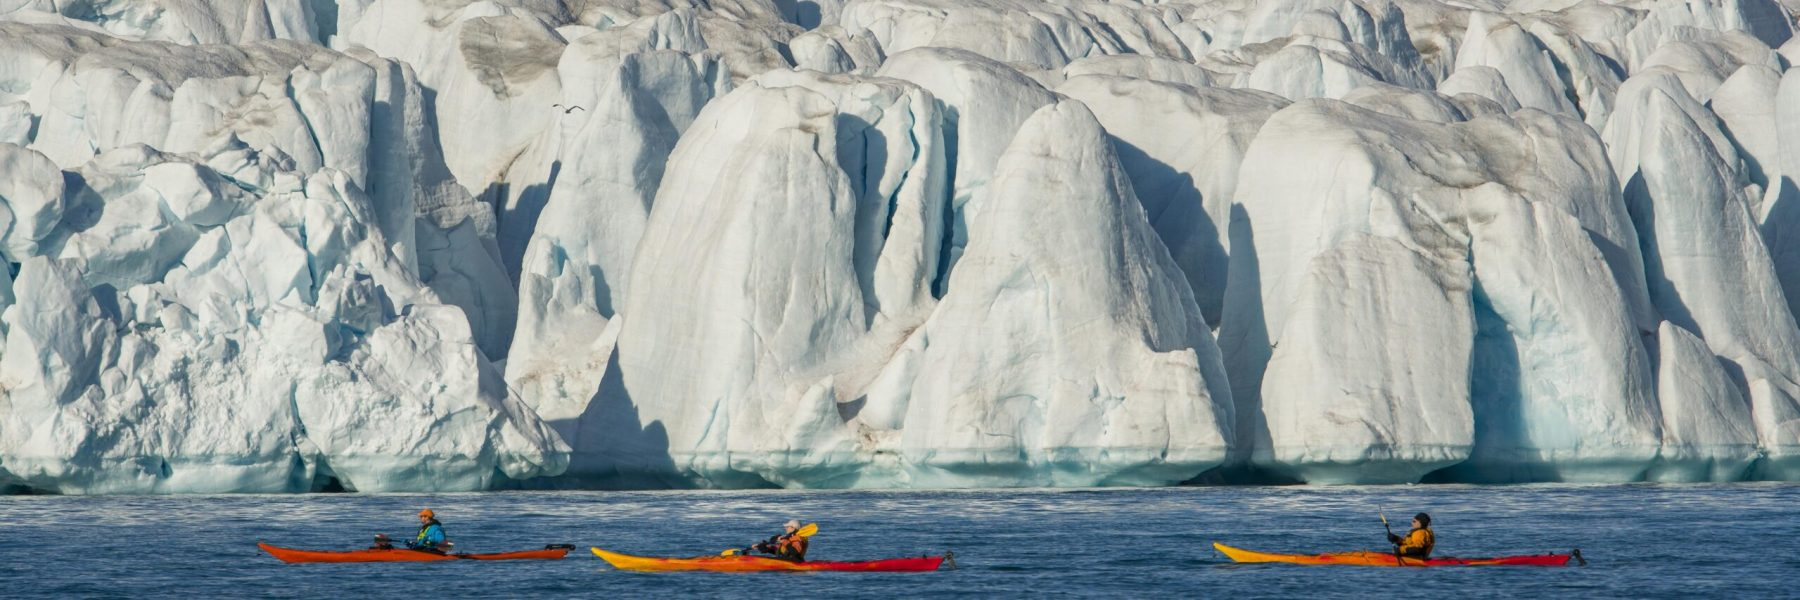 Paddler in Kajaks vor dem Croker Gletscher, Croker Bay, Devon Island, Nunavut, Arktis, Kanada